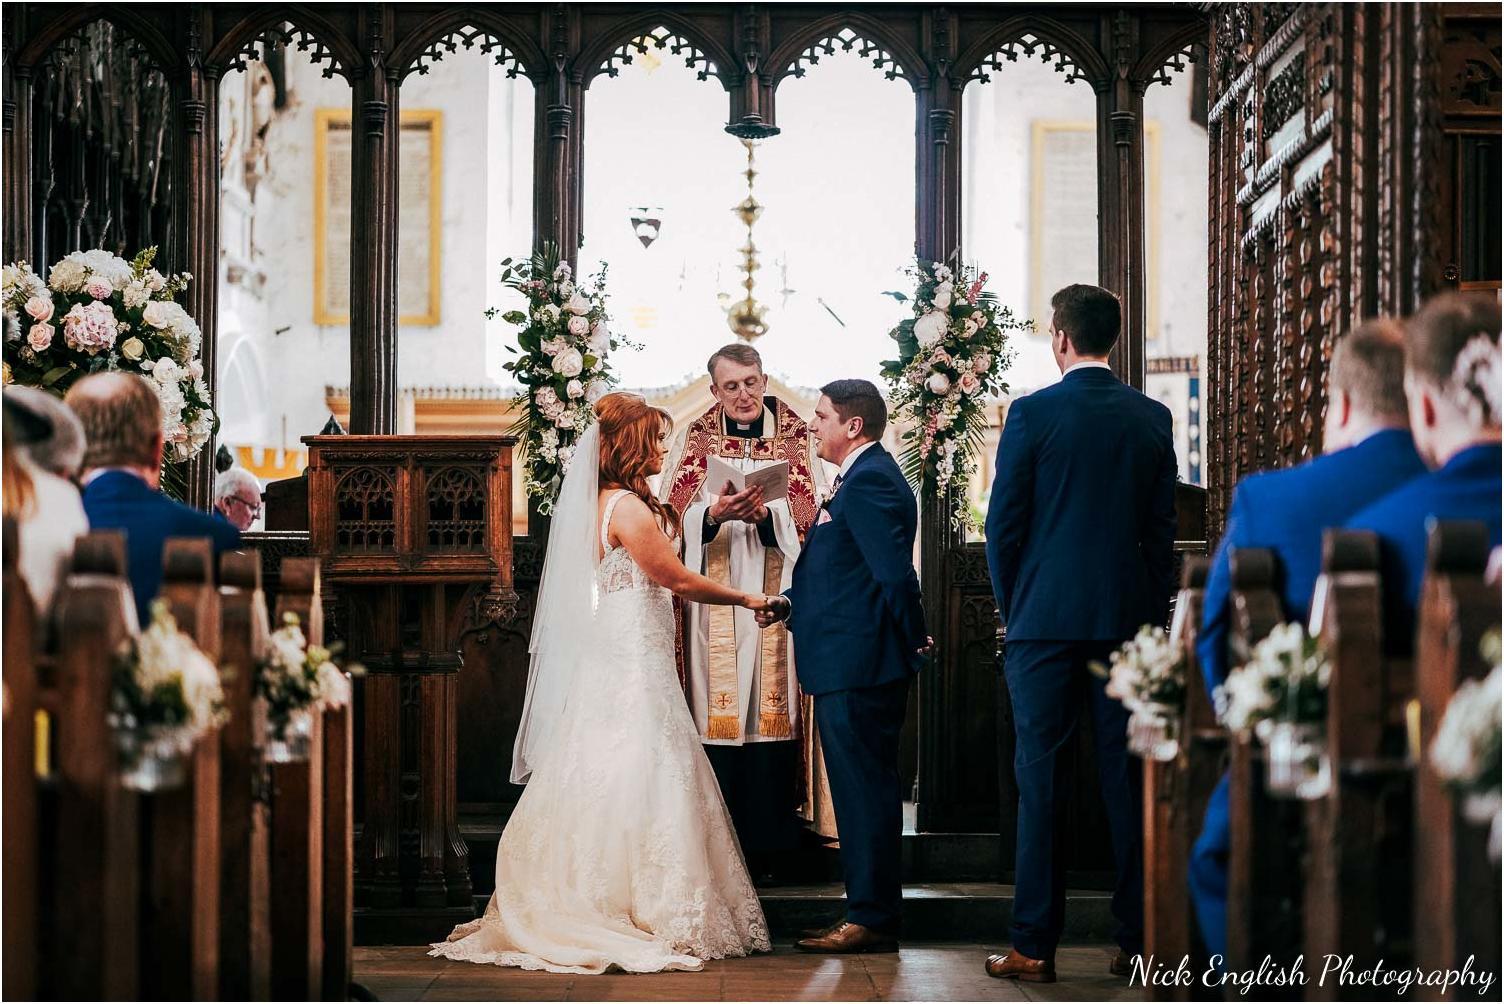 Mitton_Hall_Wedding_Photographer-55.jpg